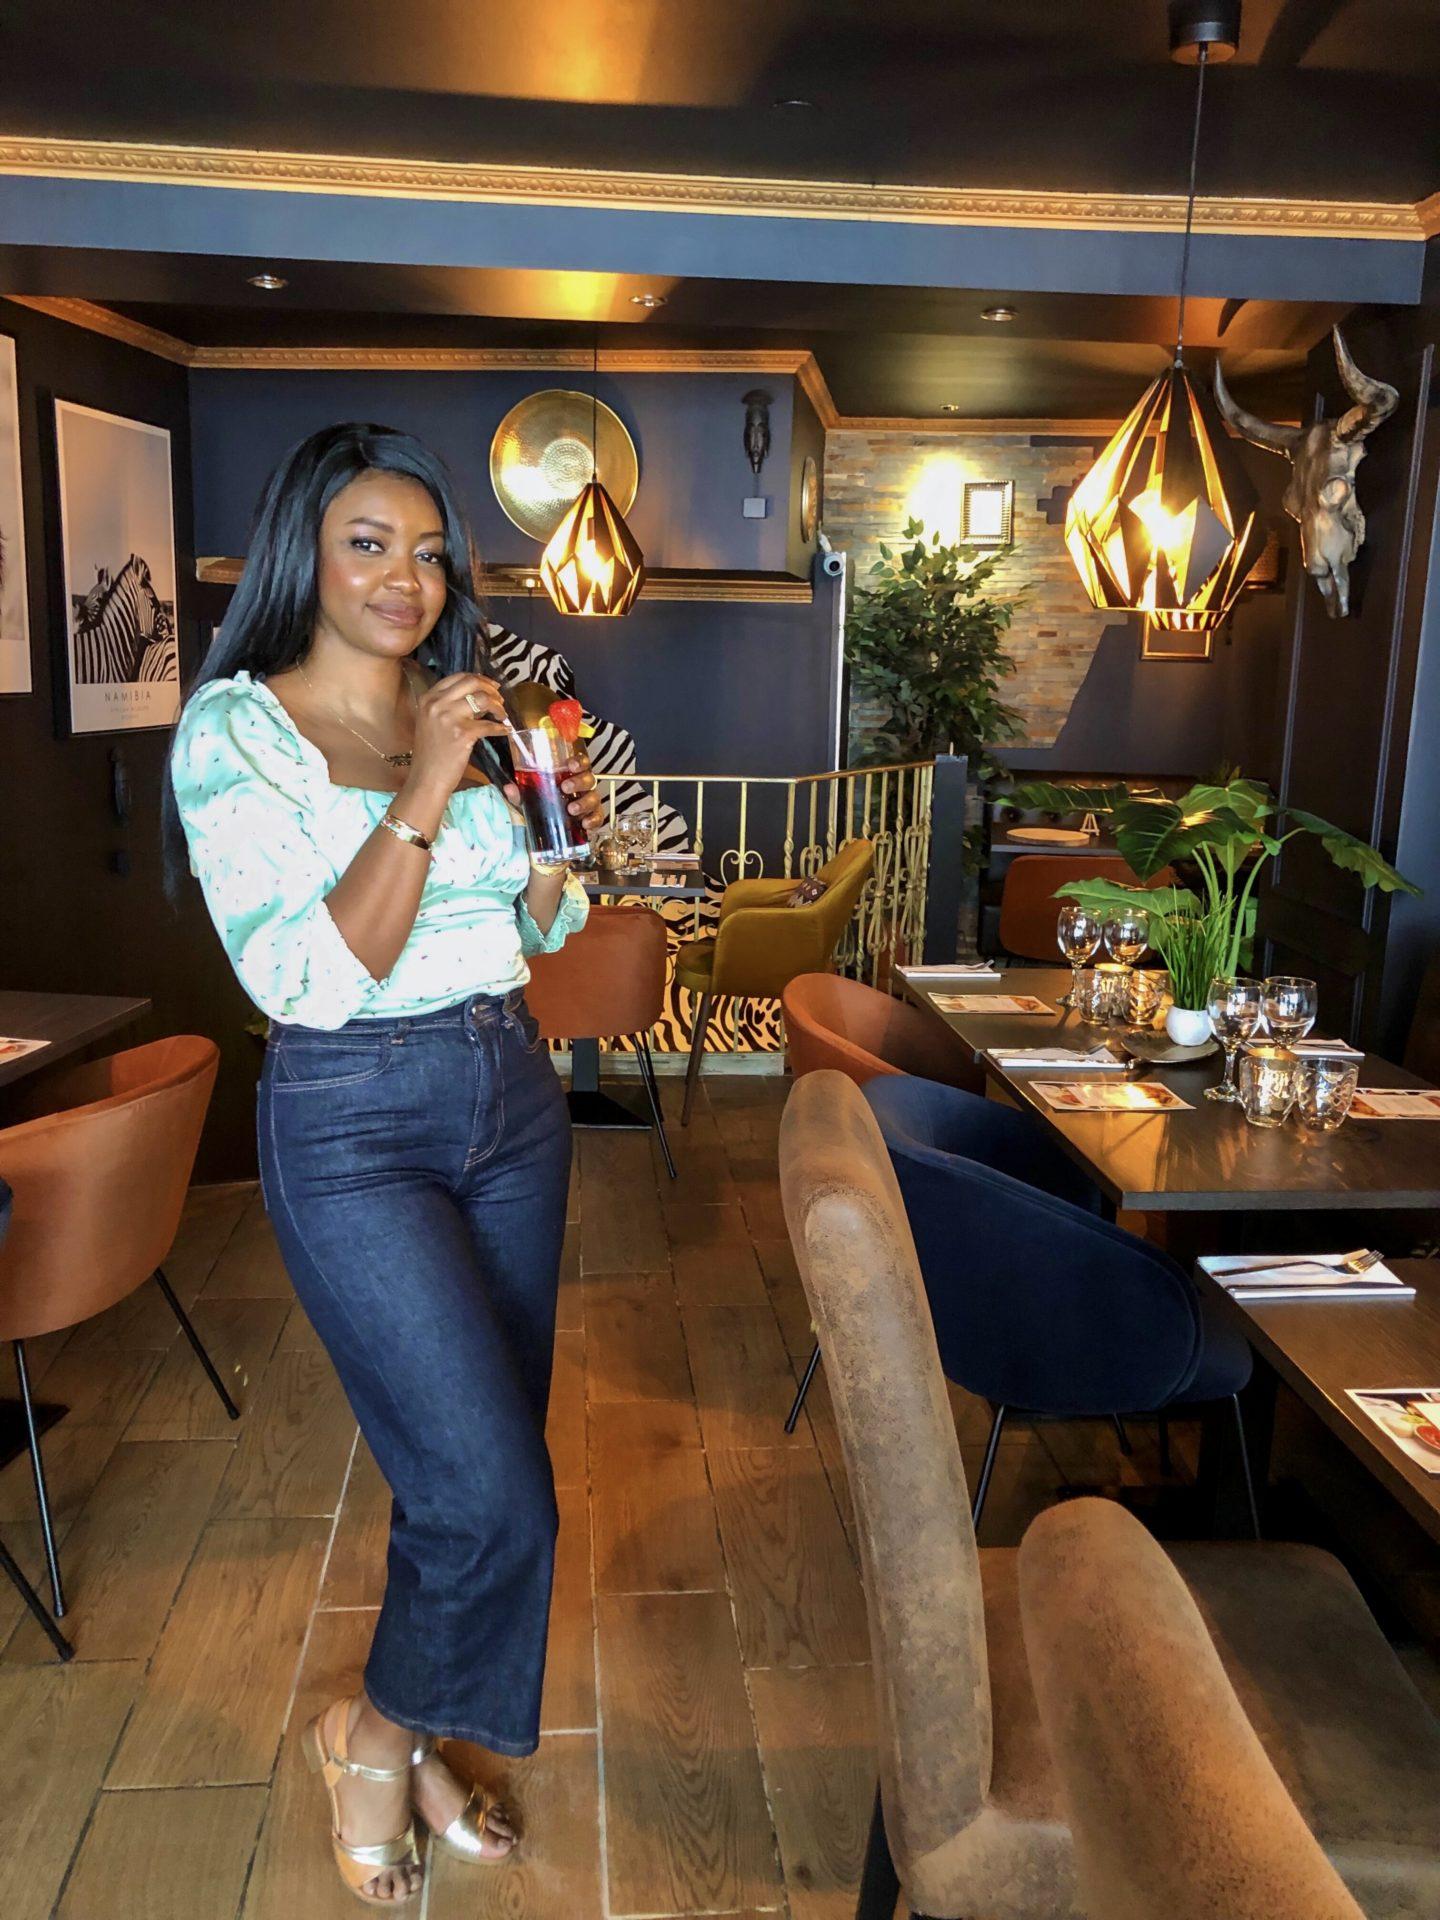 lafrodisiac restaurant africain paris foodie 02